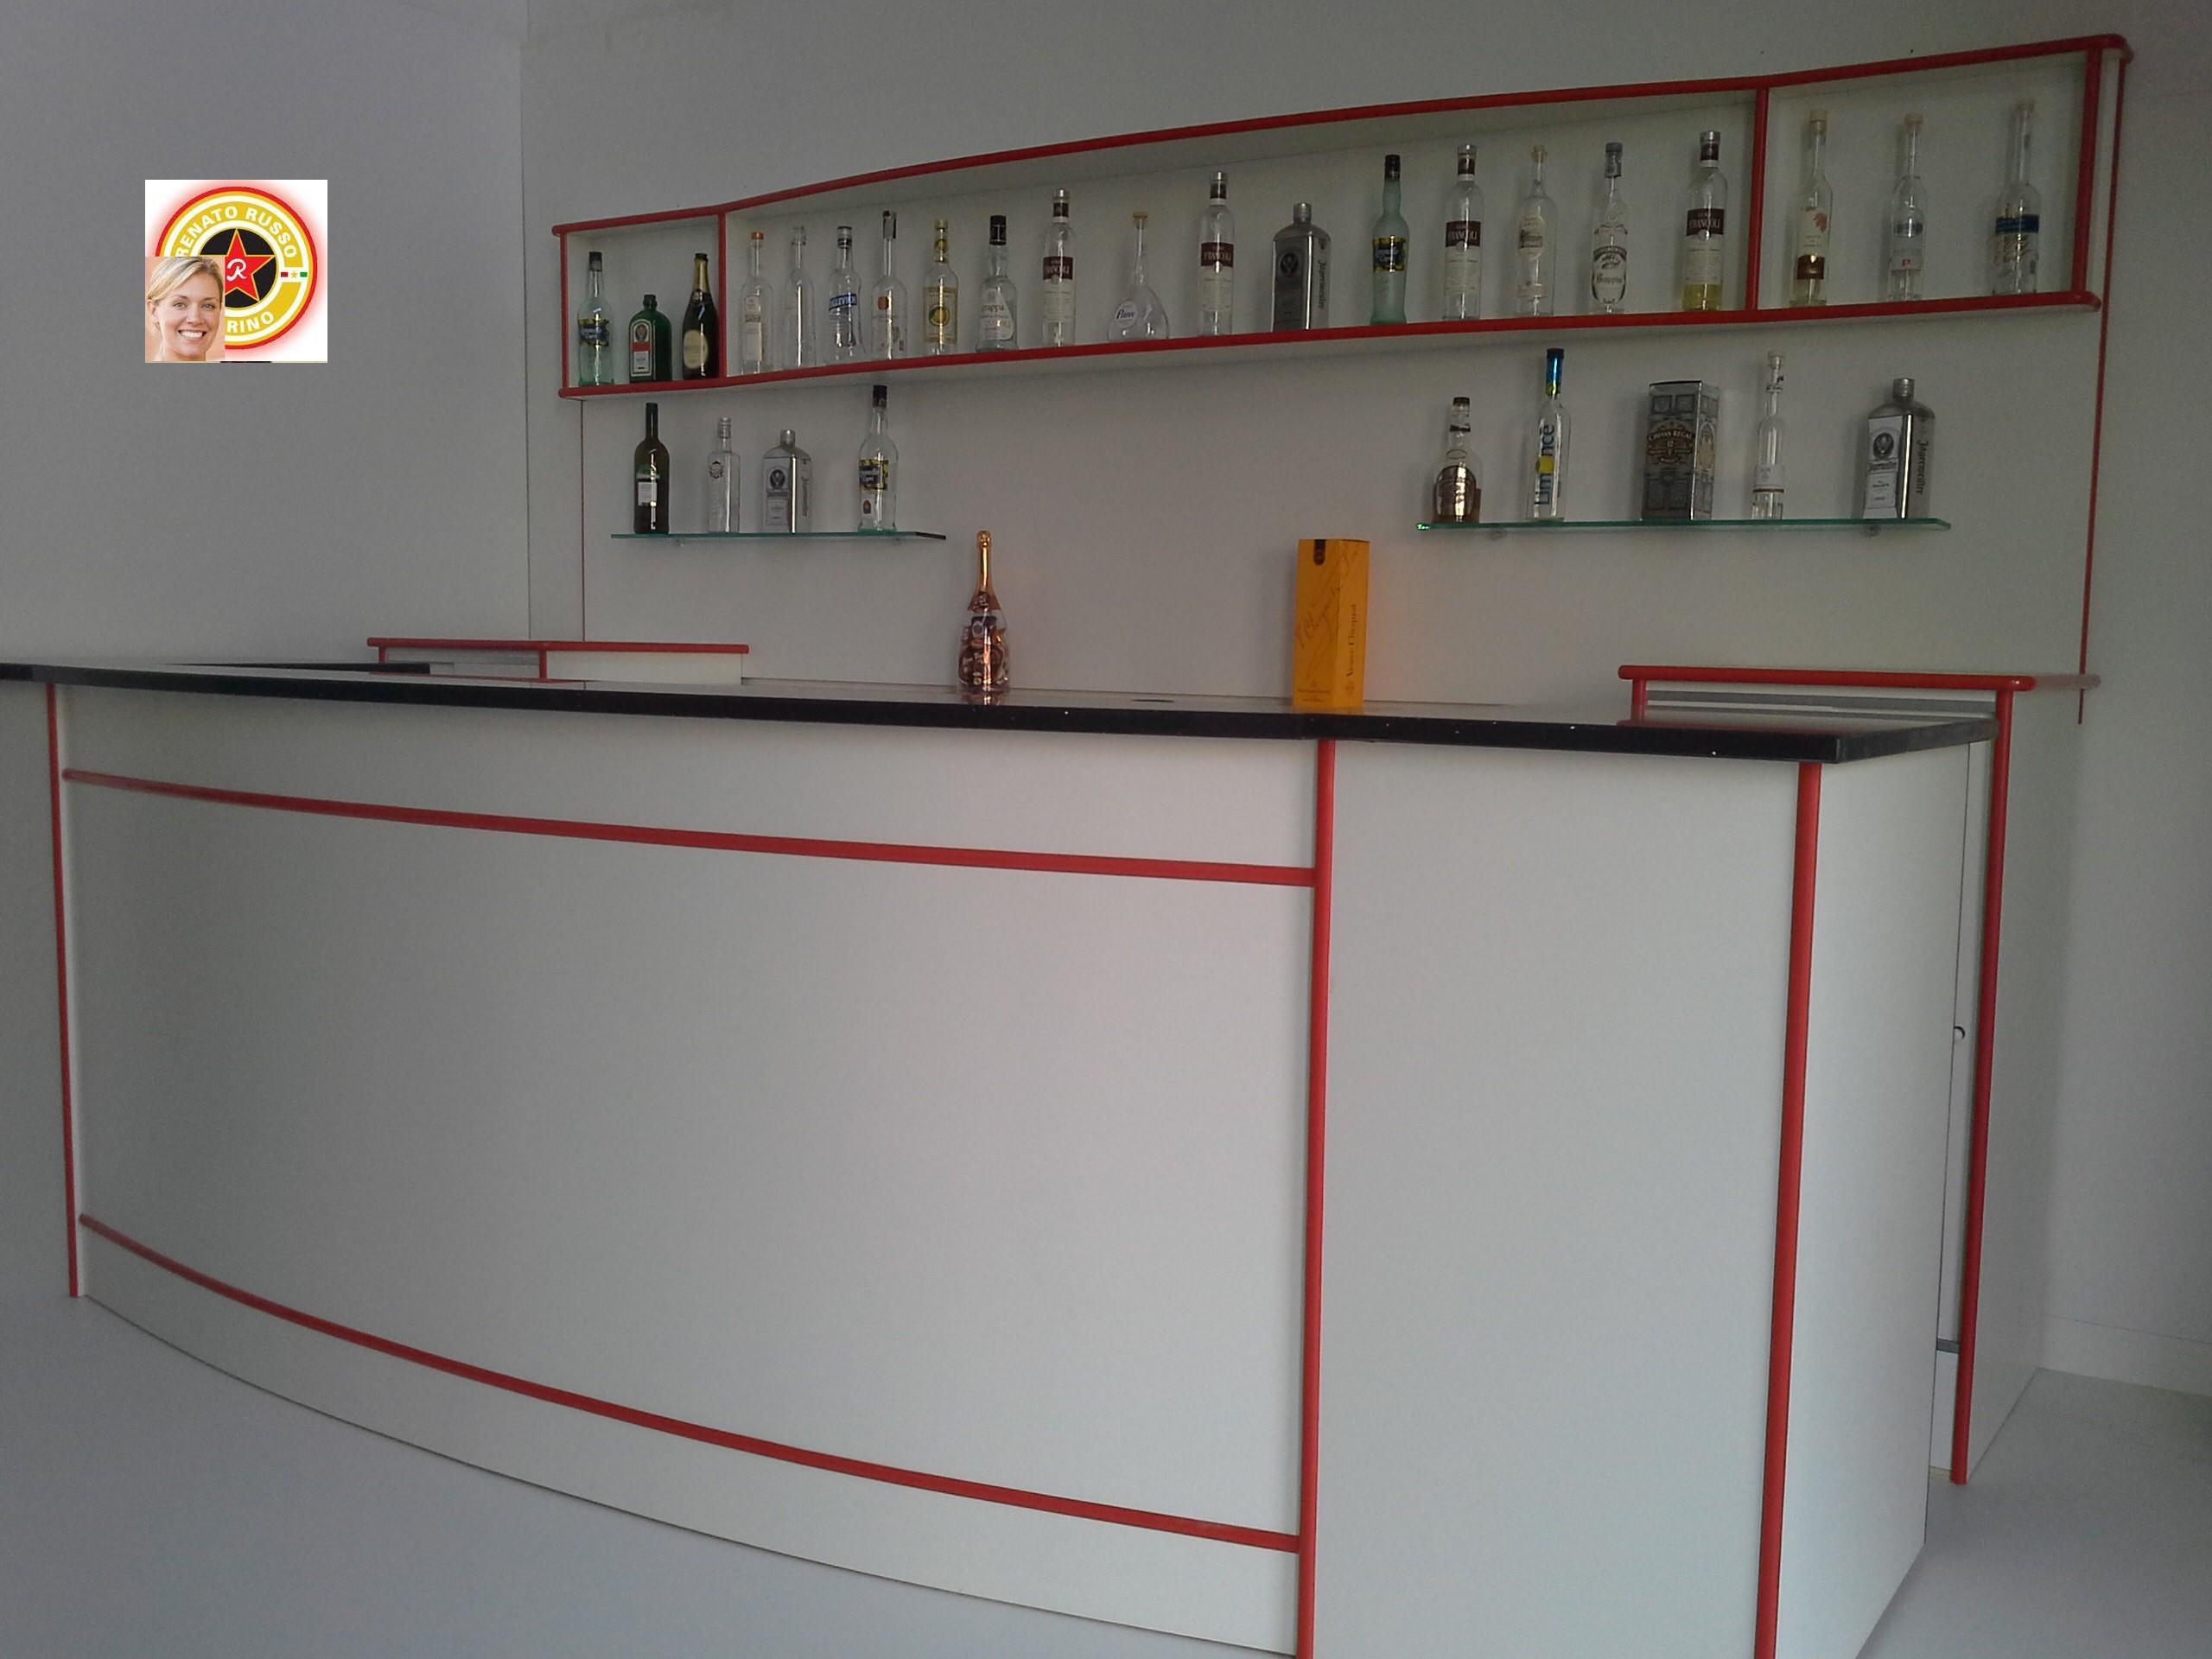 Arredamento Bar Moderno Prezzi.Banchi Bar Prezzi Banchi Bar Banconi Bar Banchi Frigo